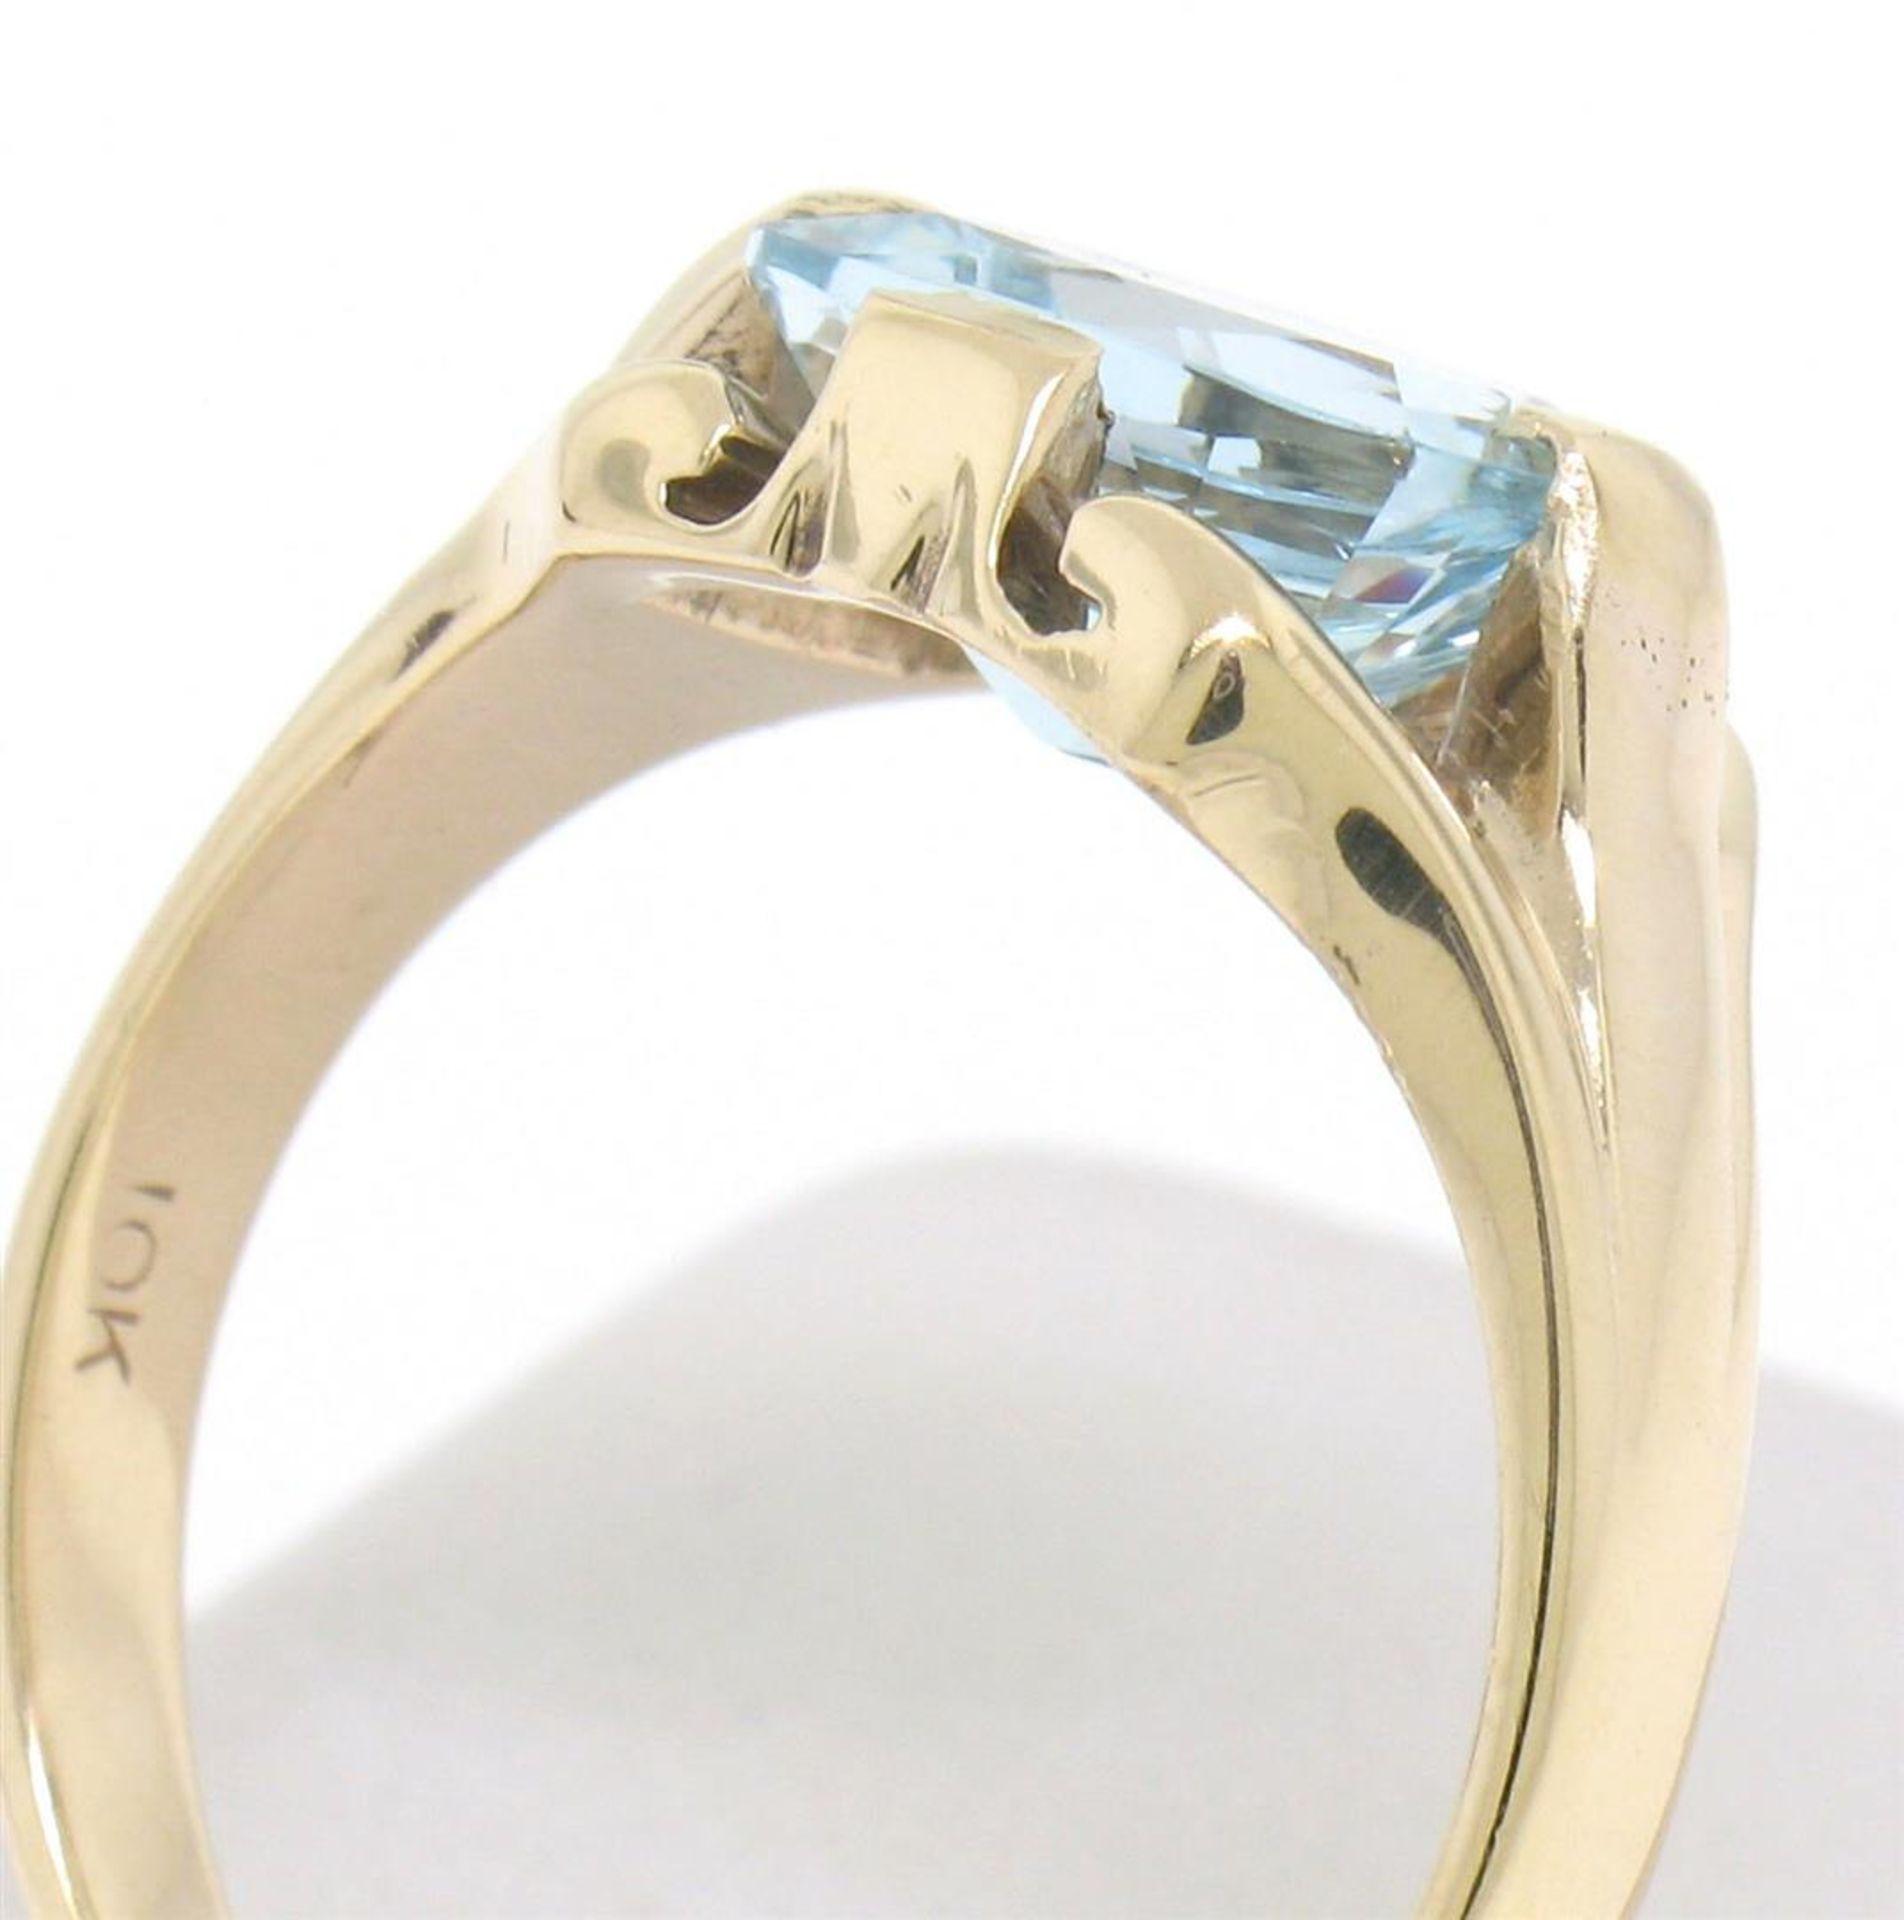 10k Gold Cushion Cut Horizontal Aquamarine Solitaire Ladies Ring - Image 2 of 4